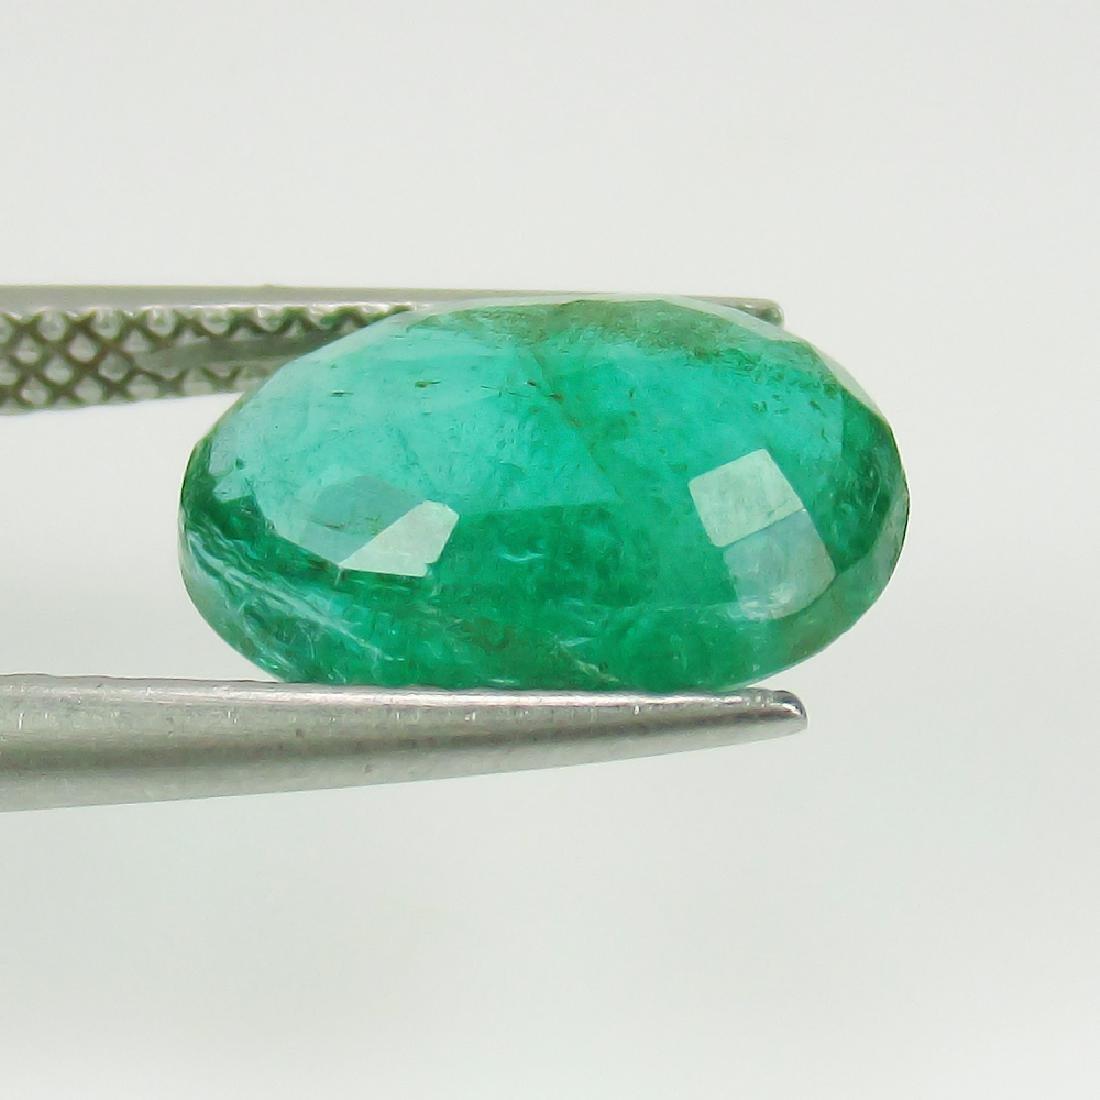 2.75 Ct IGI Certified Genuine Zambian Emerald Top Green - 3